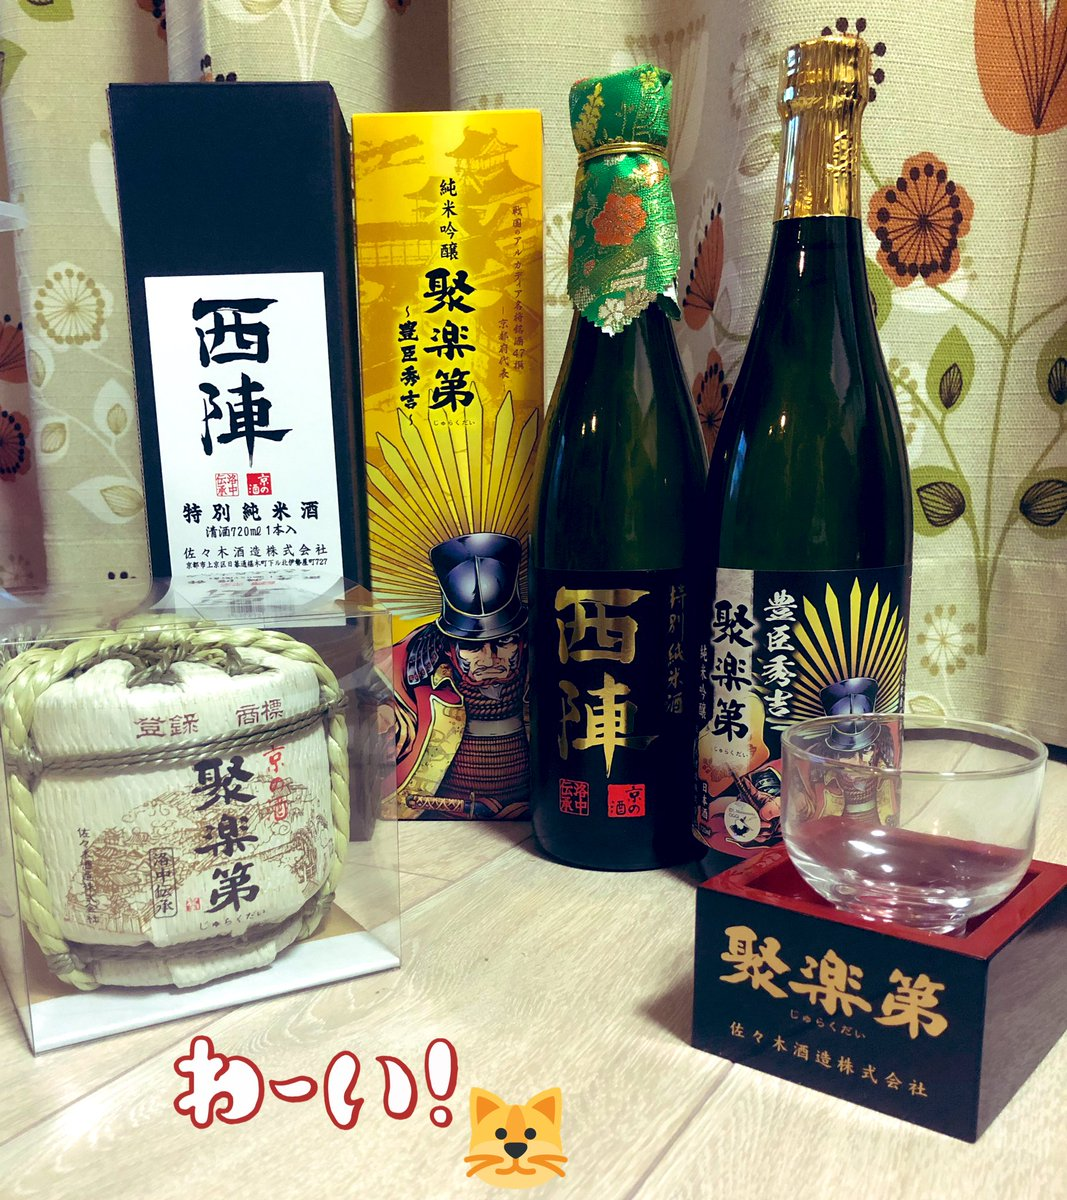 test ツイッターメディア - 佐々木酒造から届いた! わーいヾ(。゜▽゜)ノ #佐々木酒造 https://t.co/693Vy3rhwJ